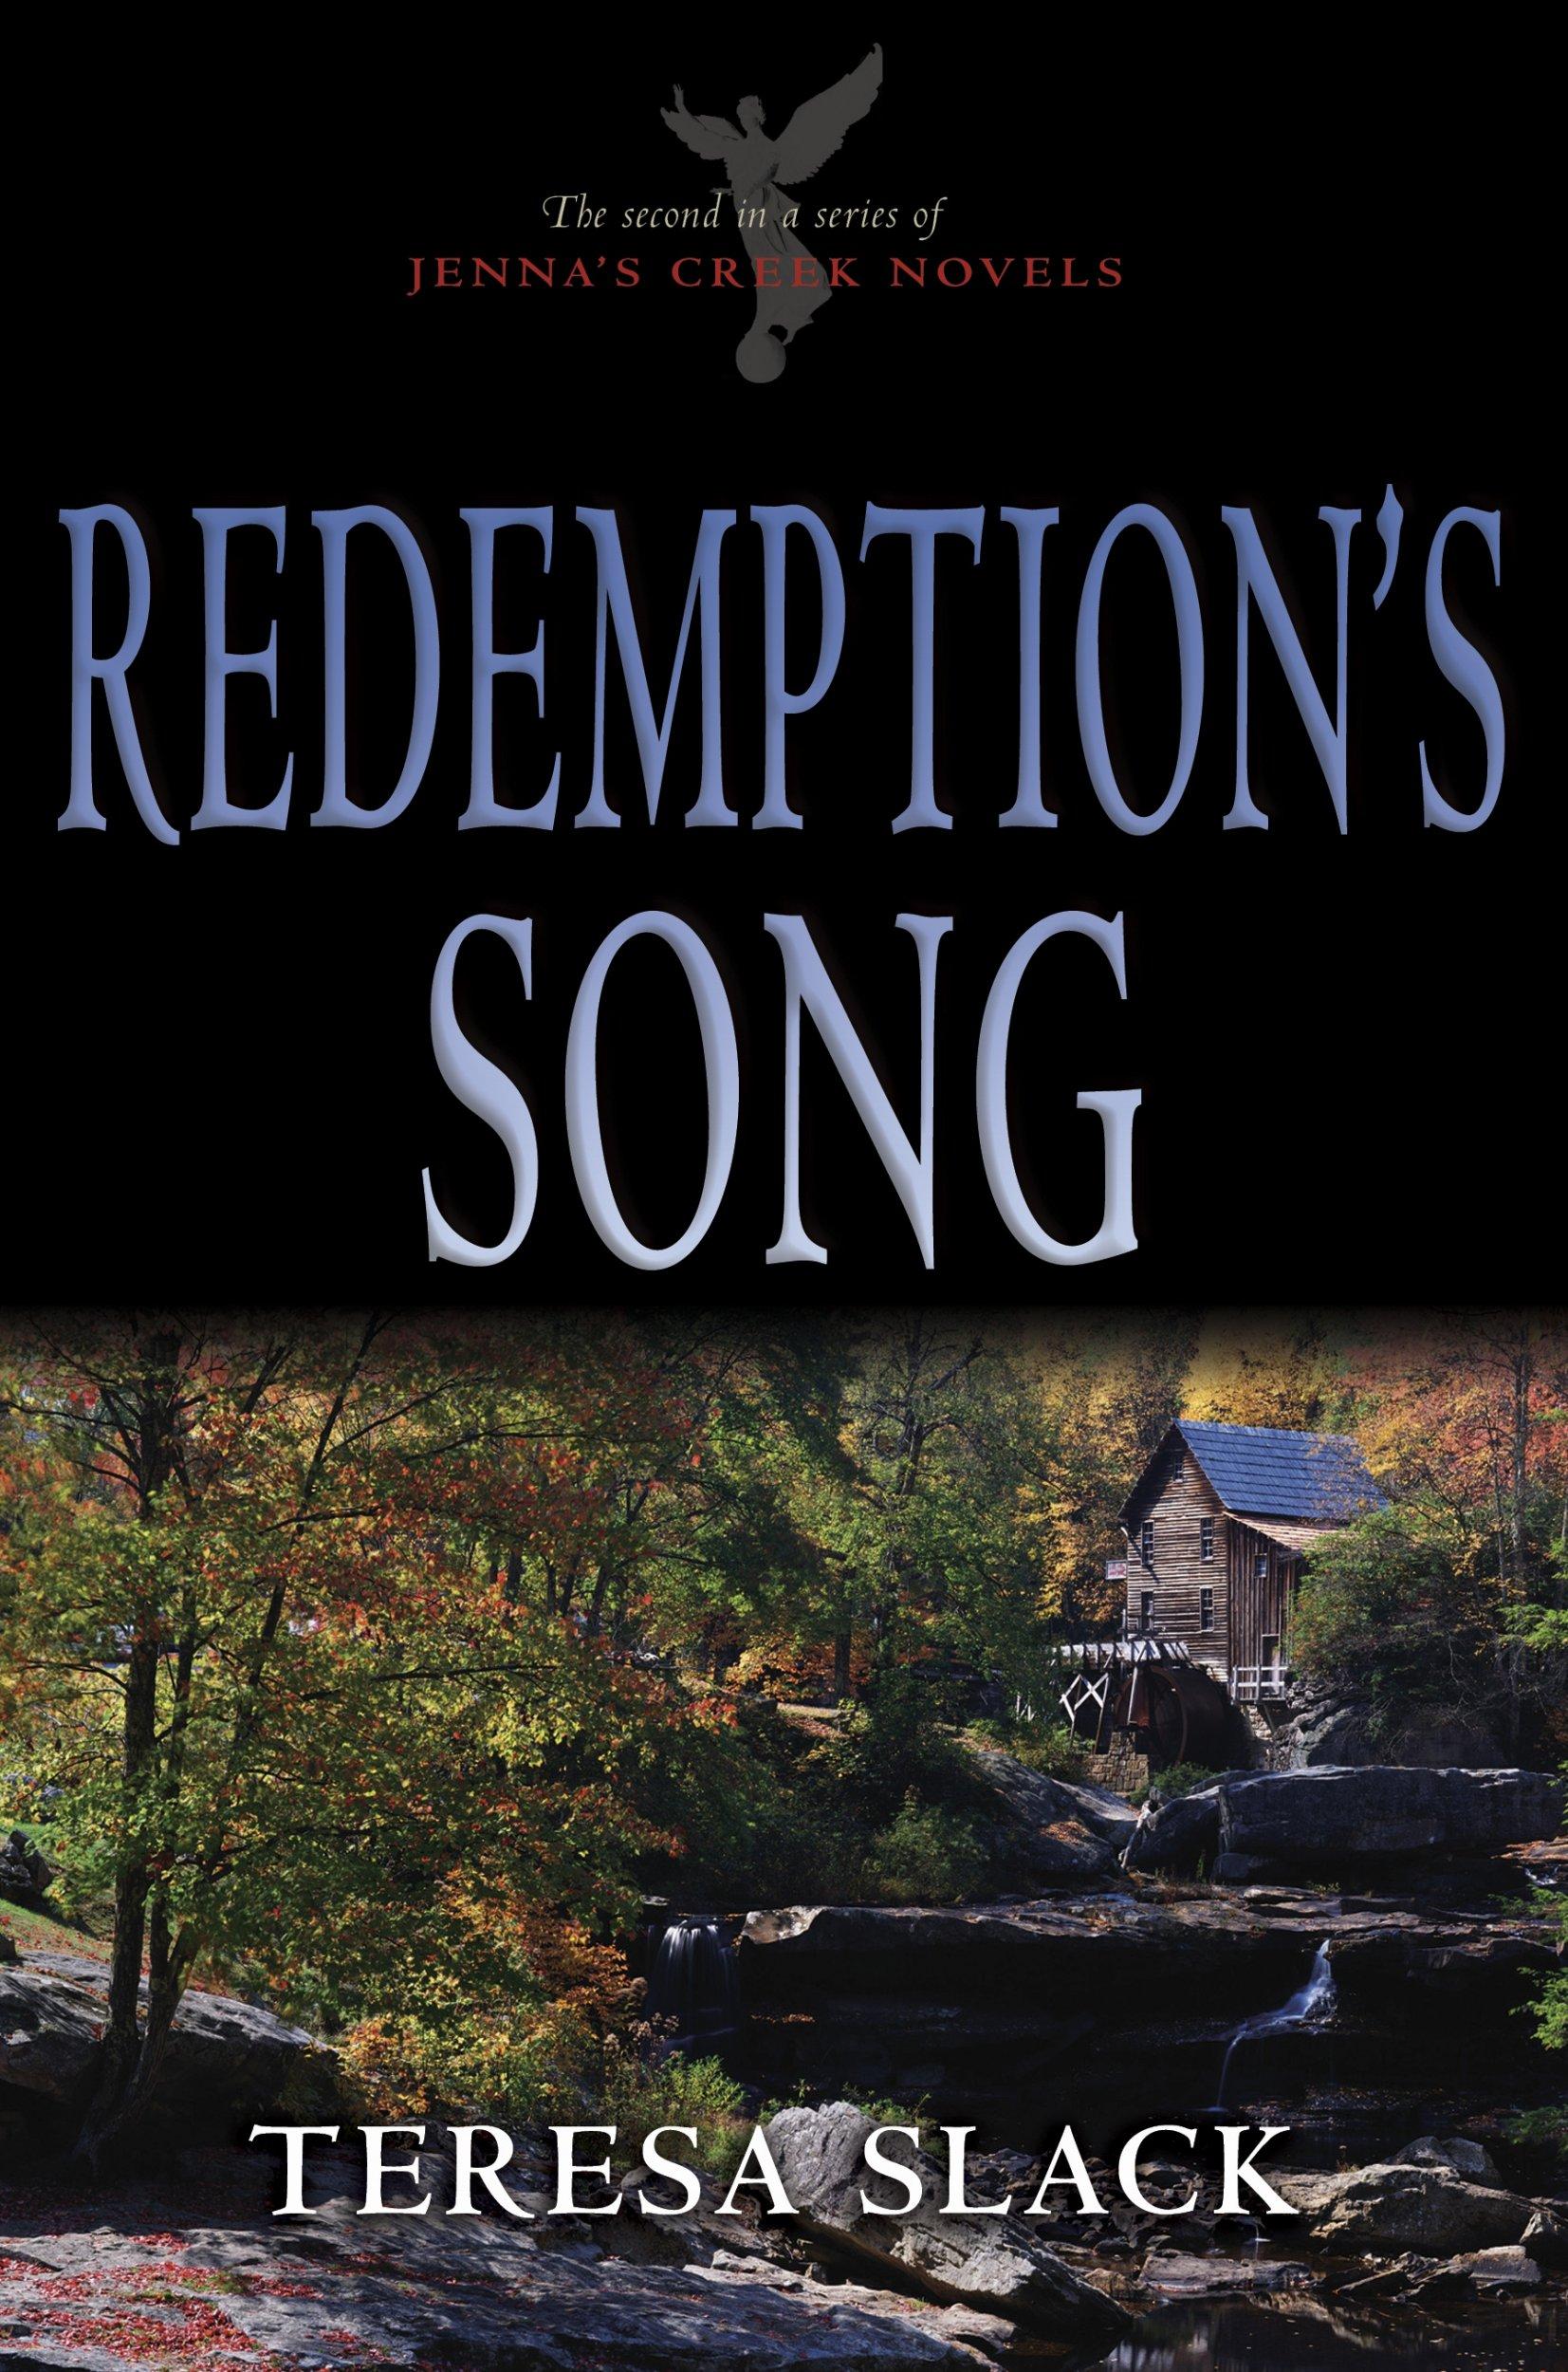 Redemption's Song (Jenna's Creek Series #2) pdf epub